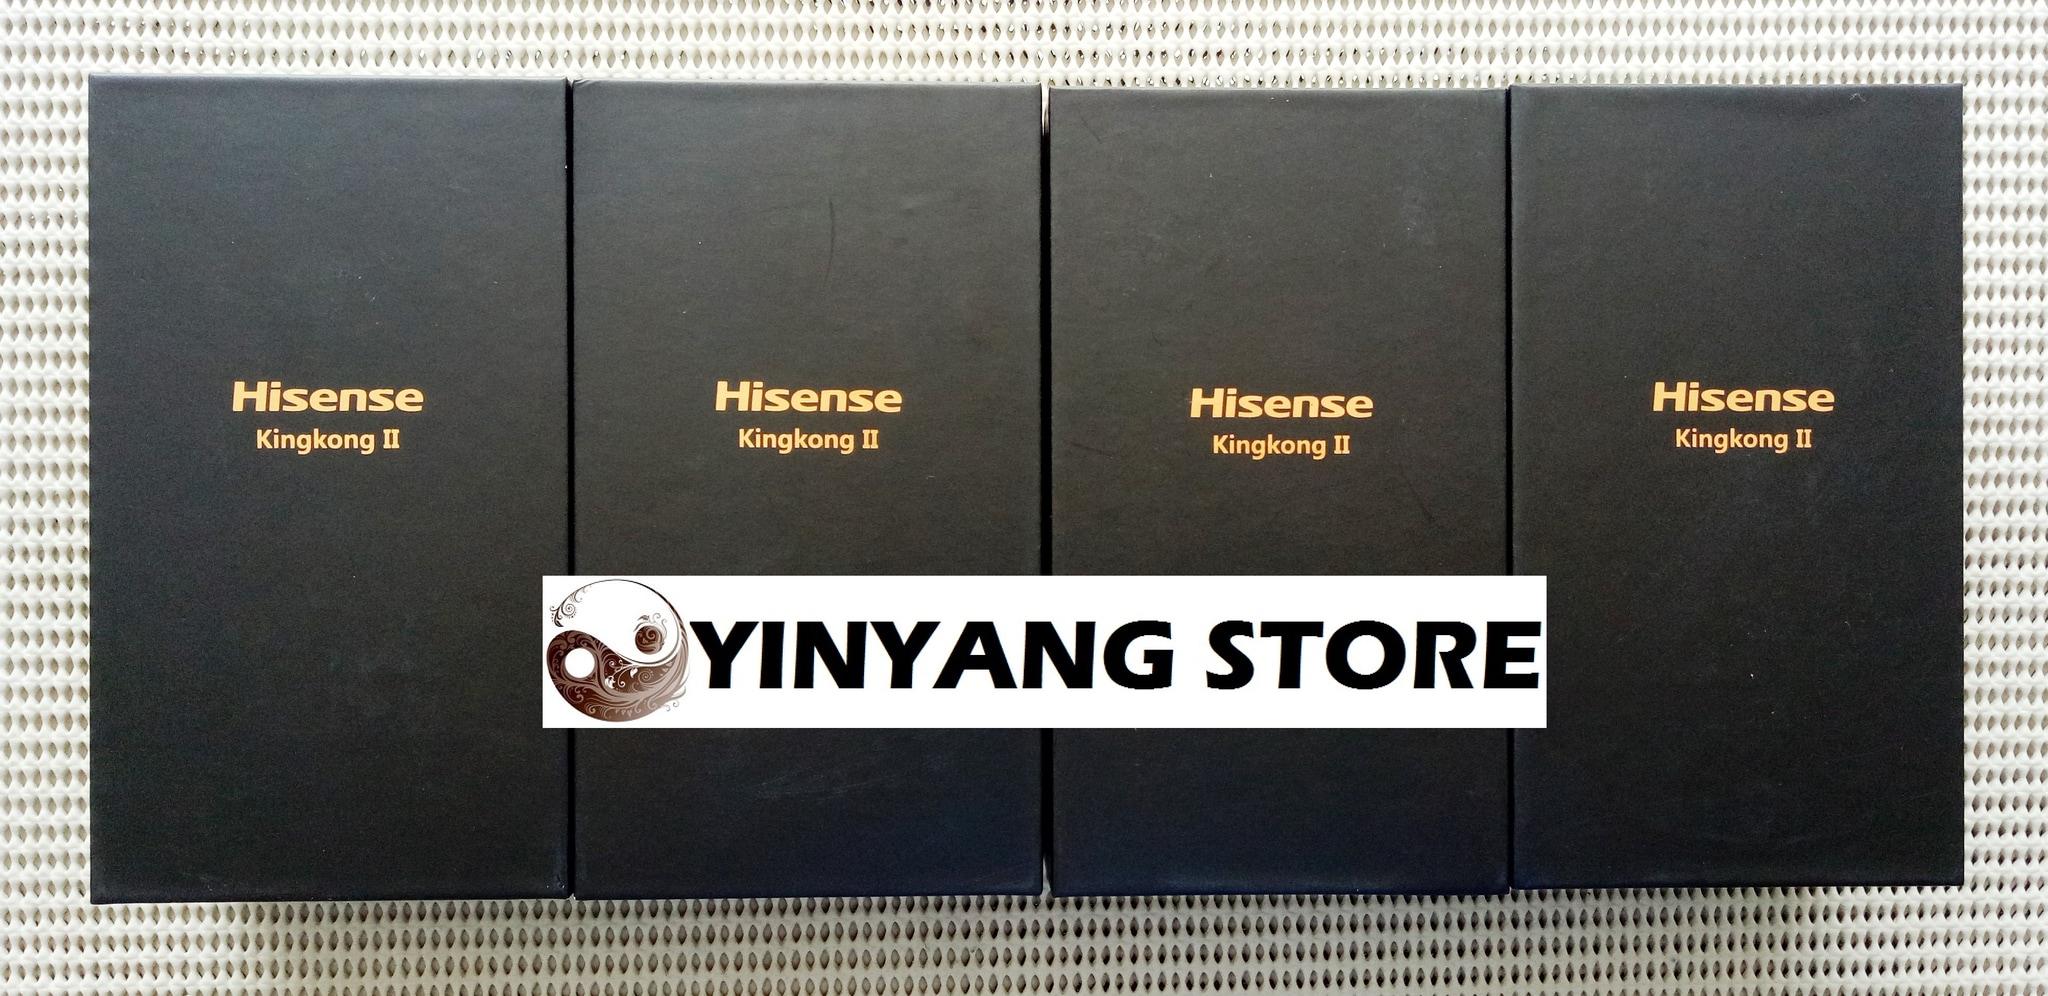 Hisense C20 Kingkong 2 16gb Hitam Review Harga Terkini Dan Elegant Pudding Tpu Soft Case Ii Jual Lte Garansi Resmi Antigores Bening Yinyang Store Tokopedia